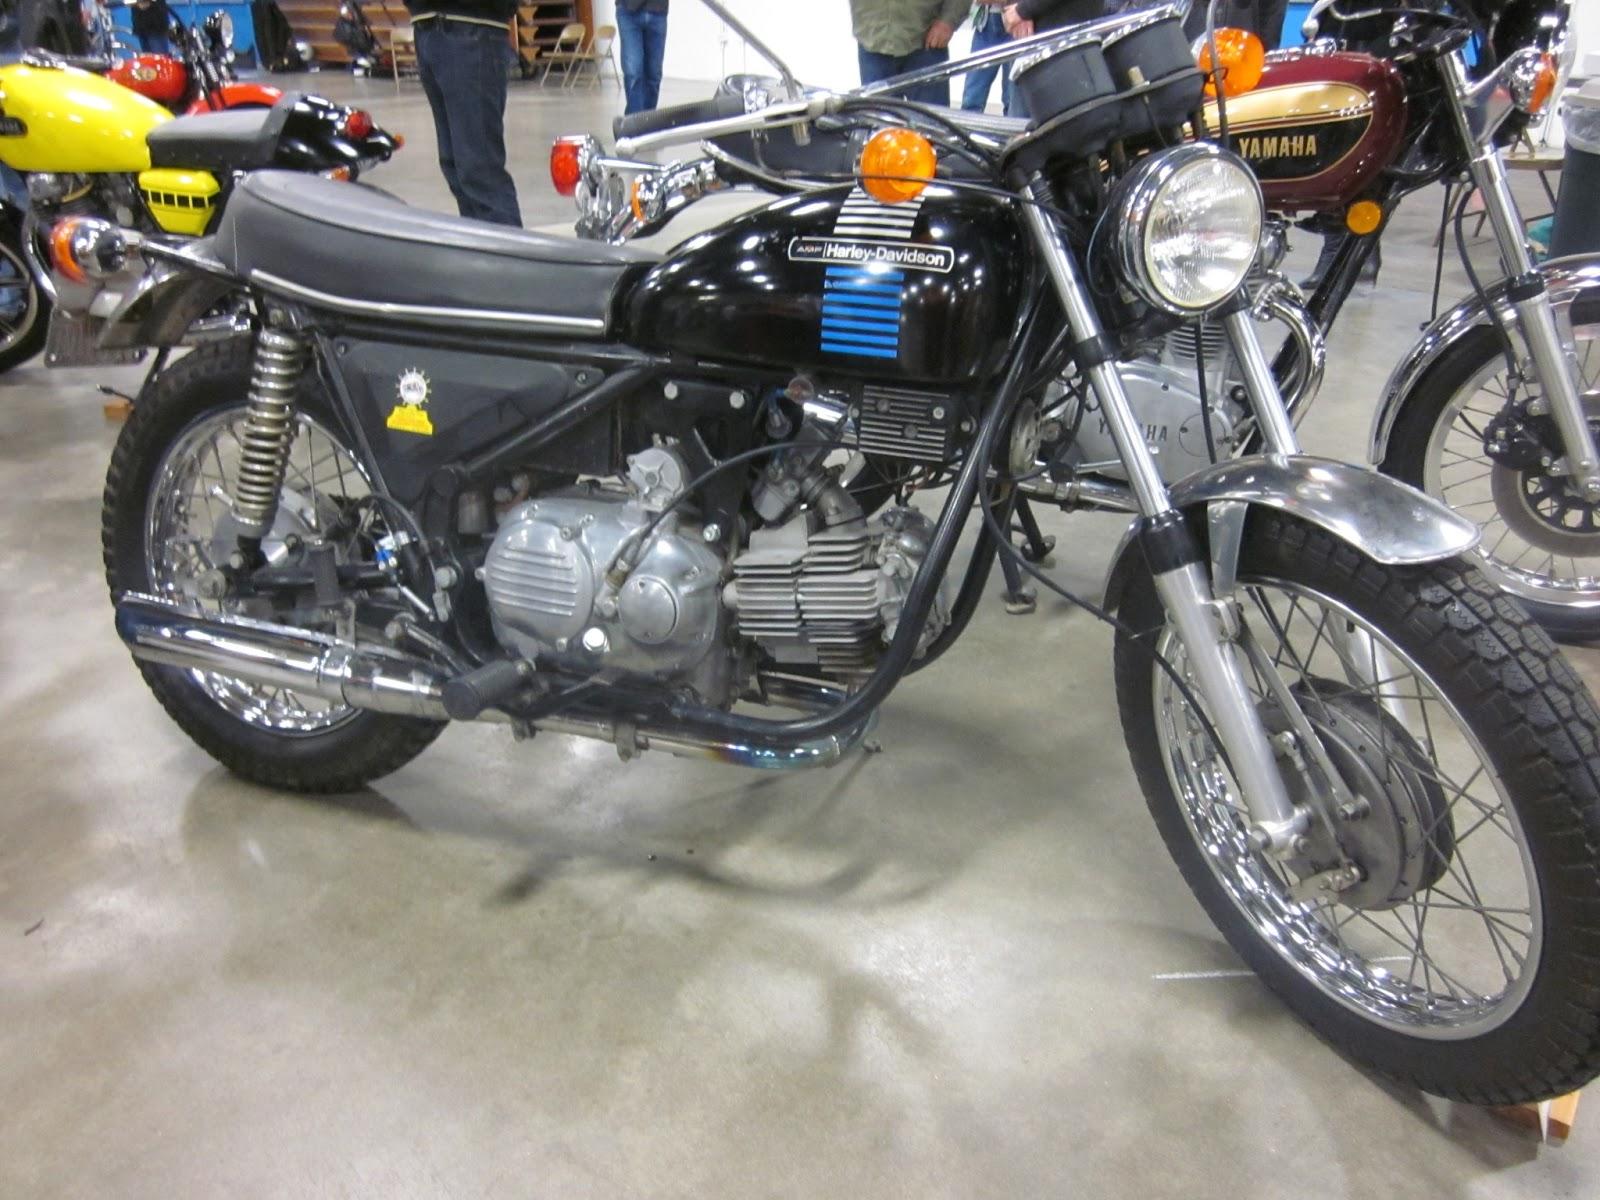 OldMotoDude: Sold my 1973 Harley Davidson -- Aermacchi SS350 Sprint